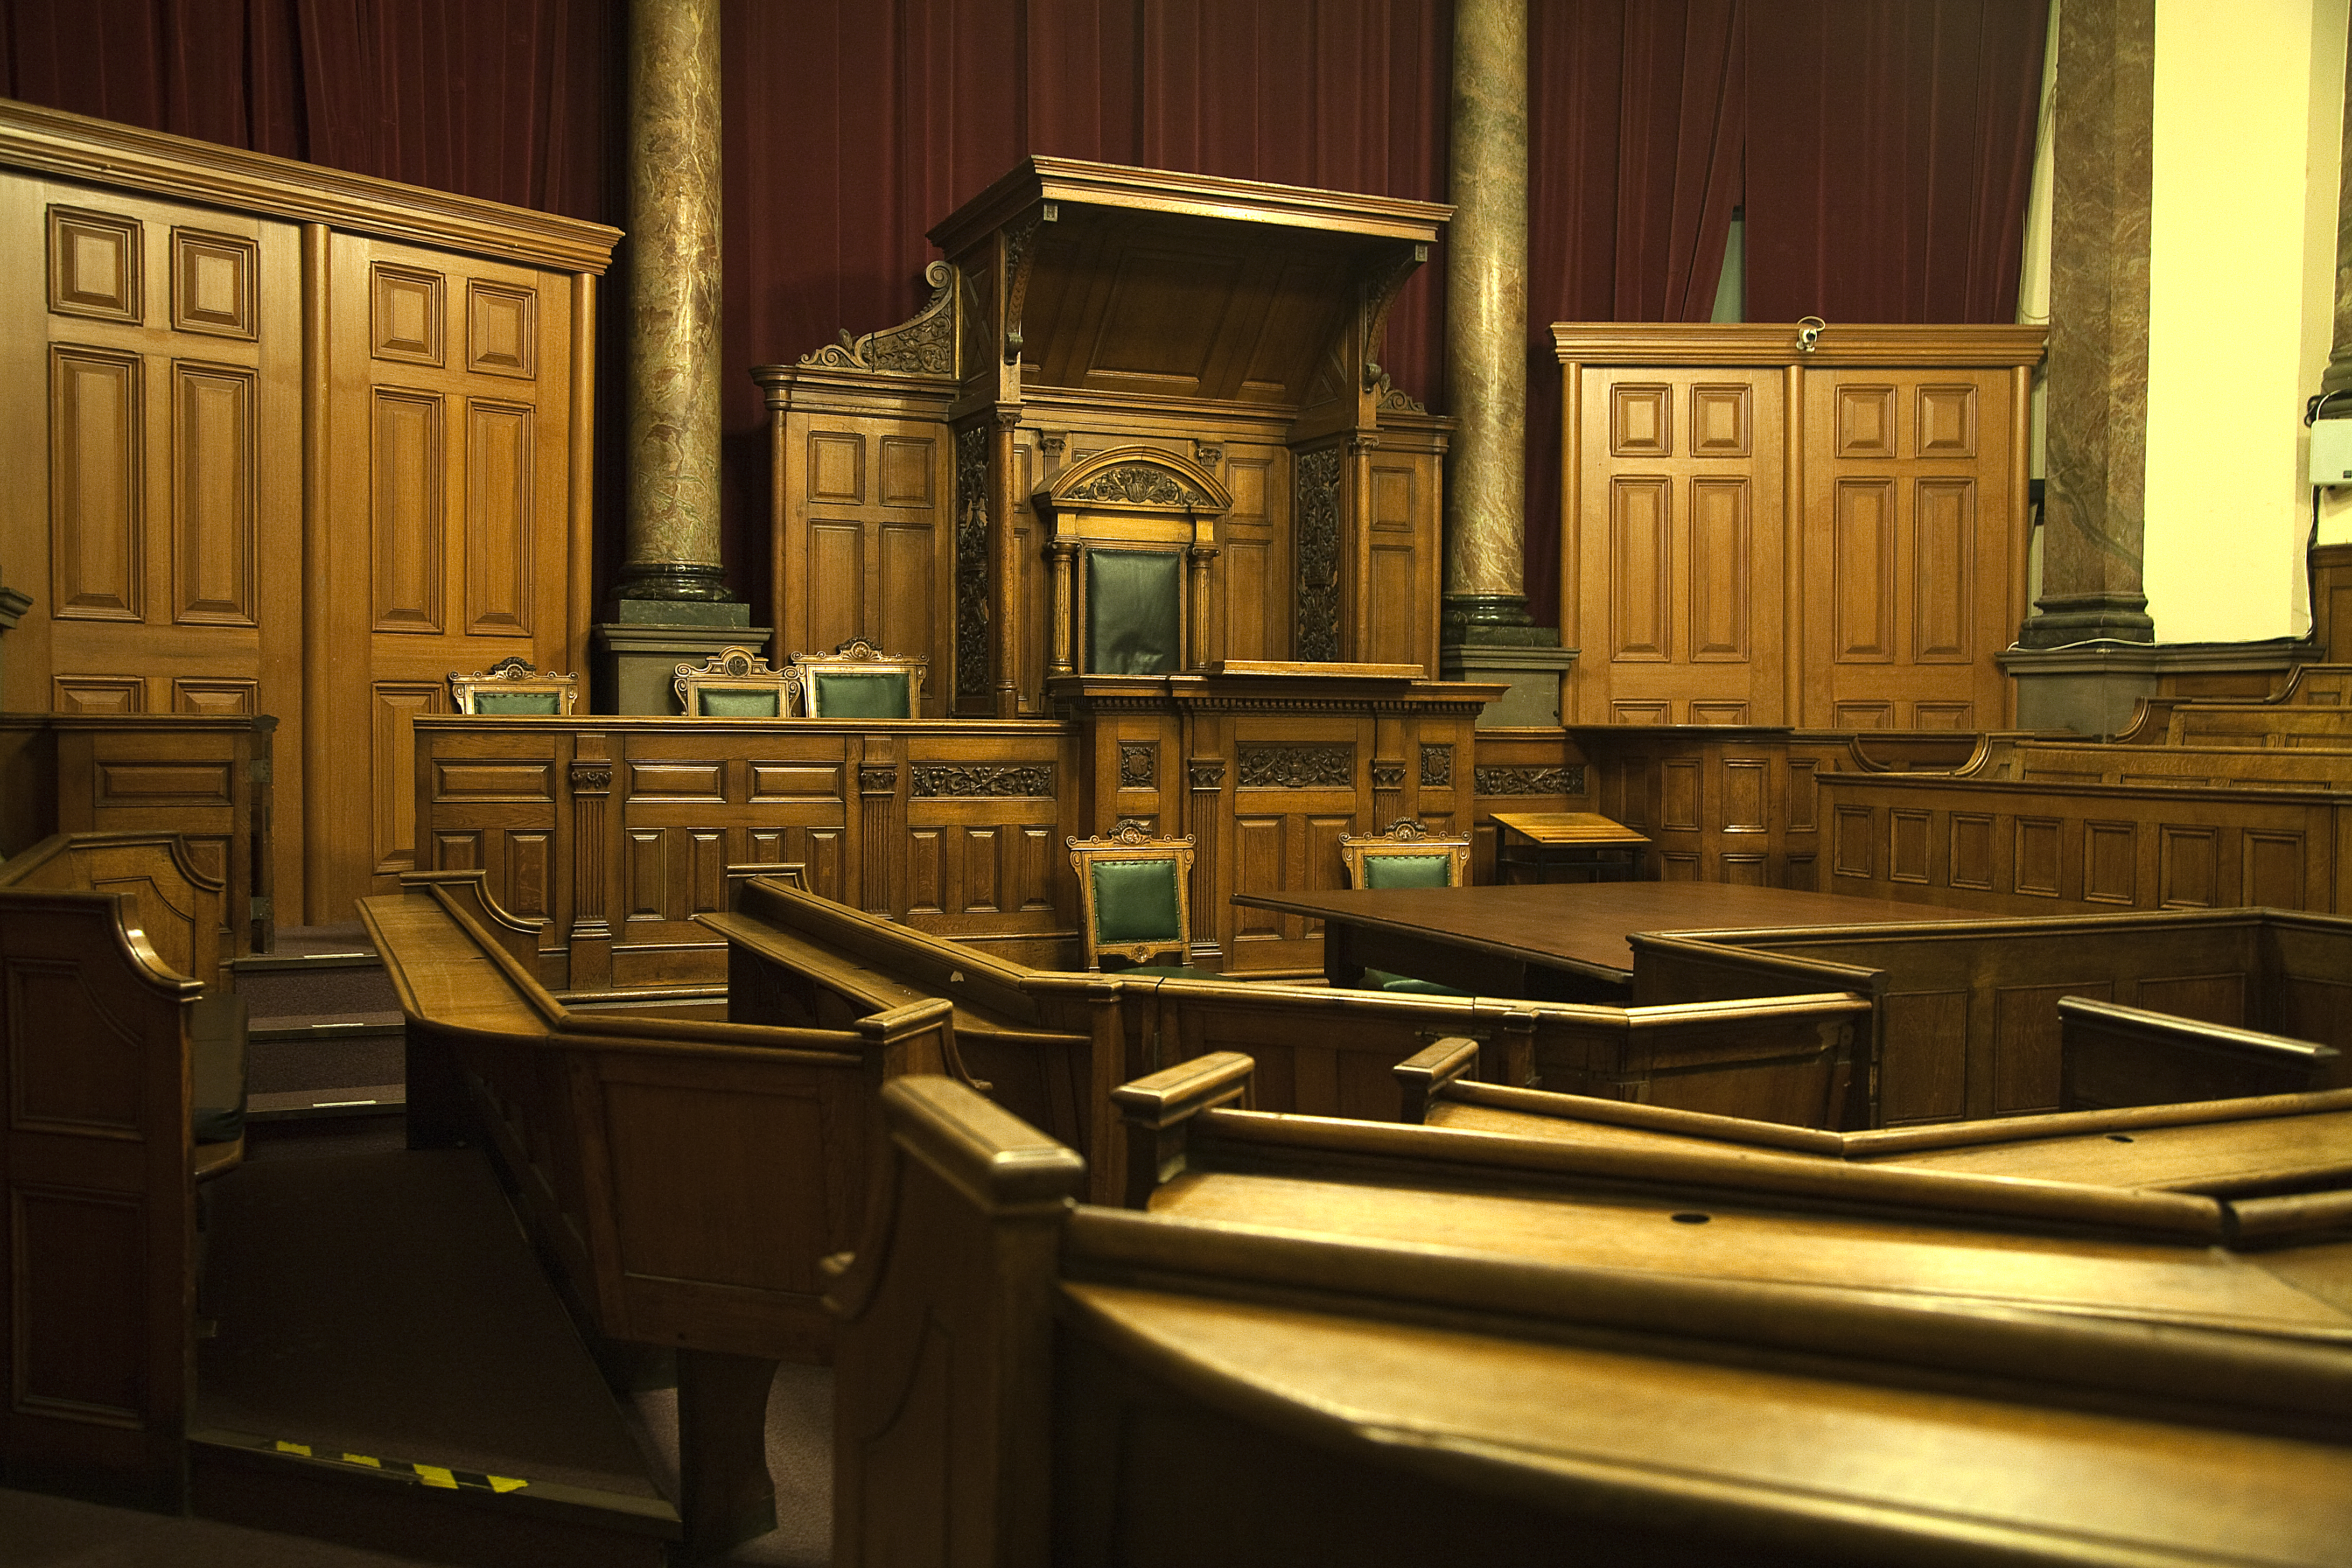 Victorian_Civil_Courtroom%2C_National_Justice_Museum%2C_June_2010.jpg